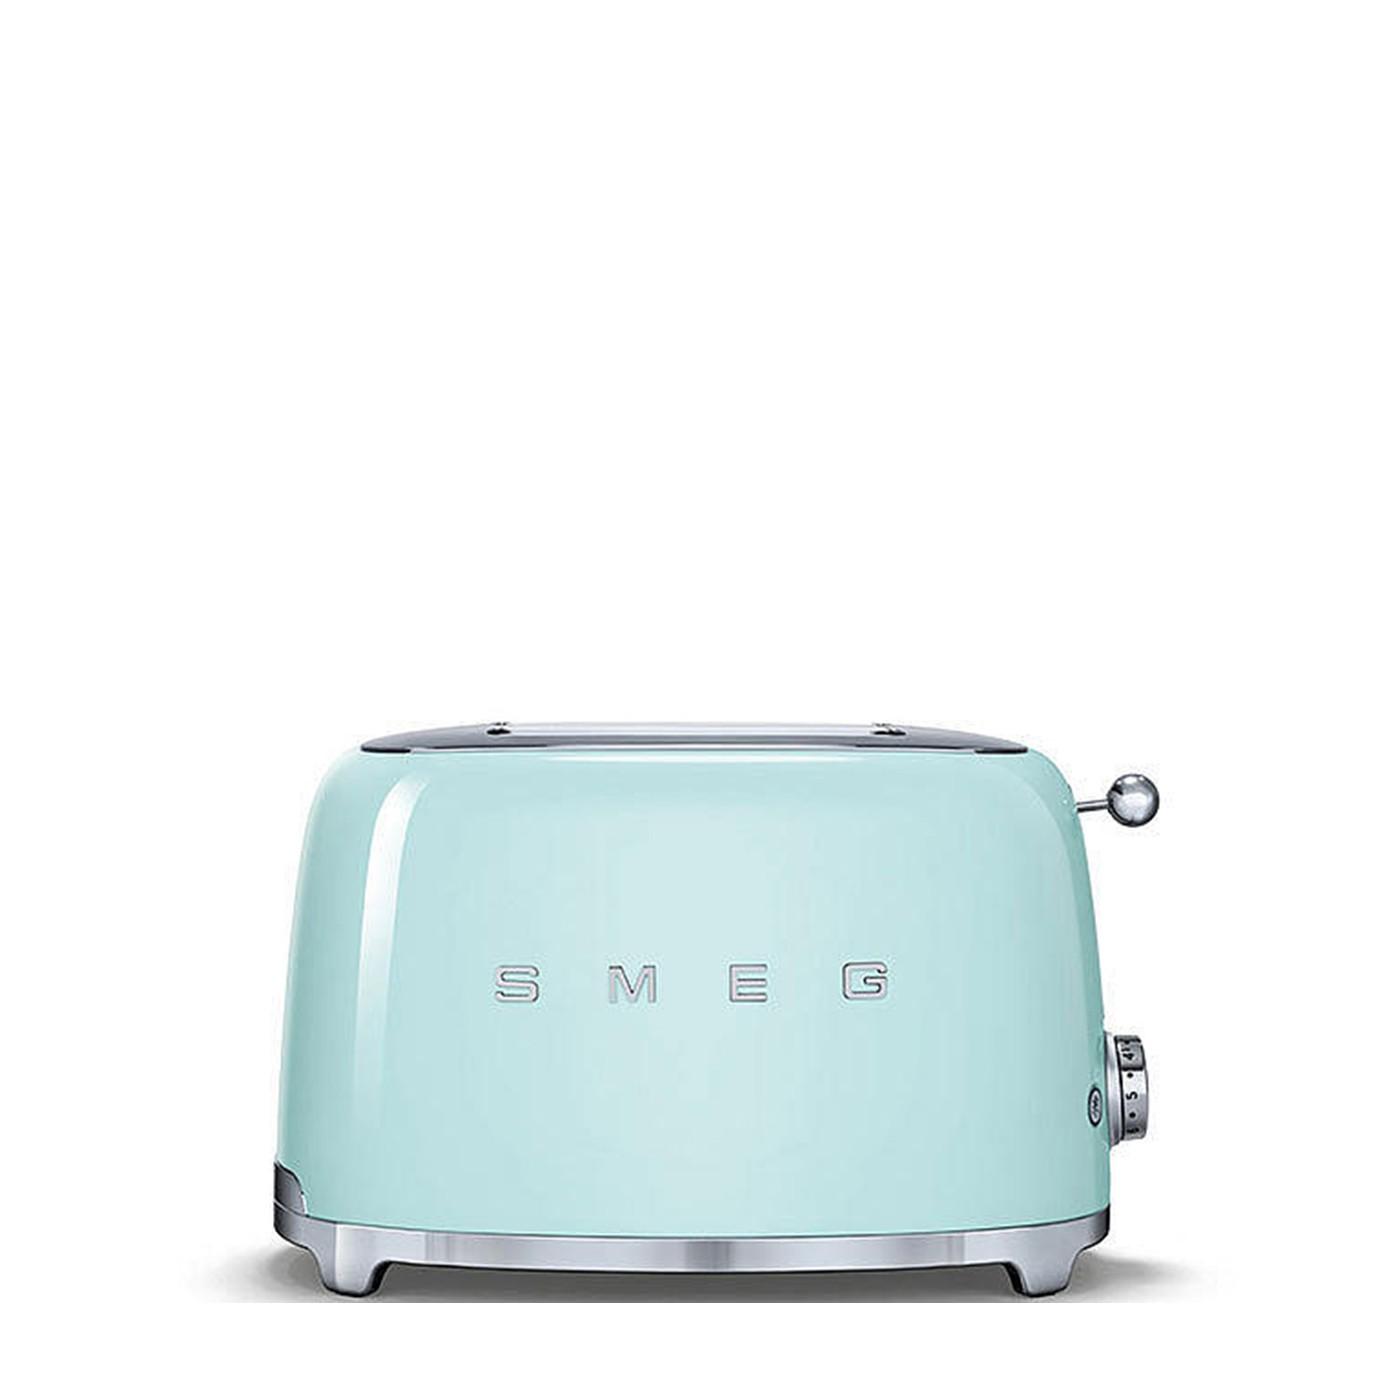 Pastel Green Toaster